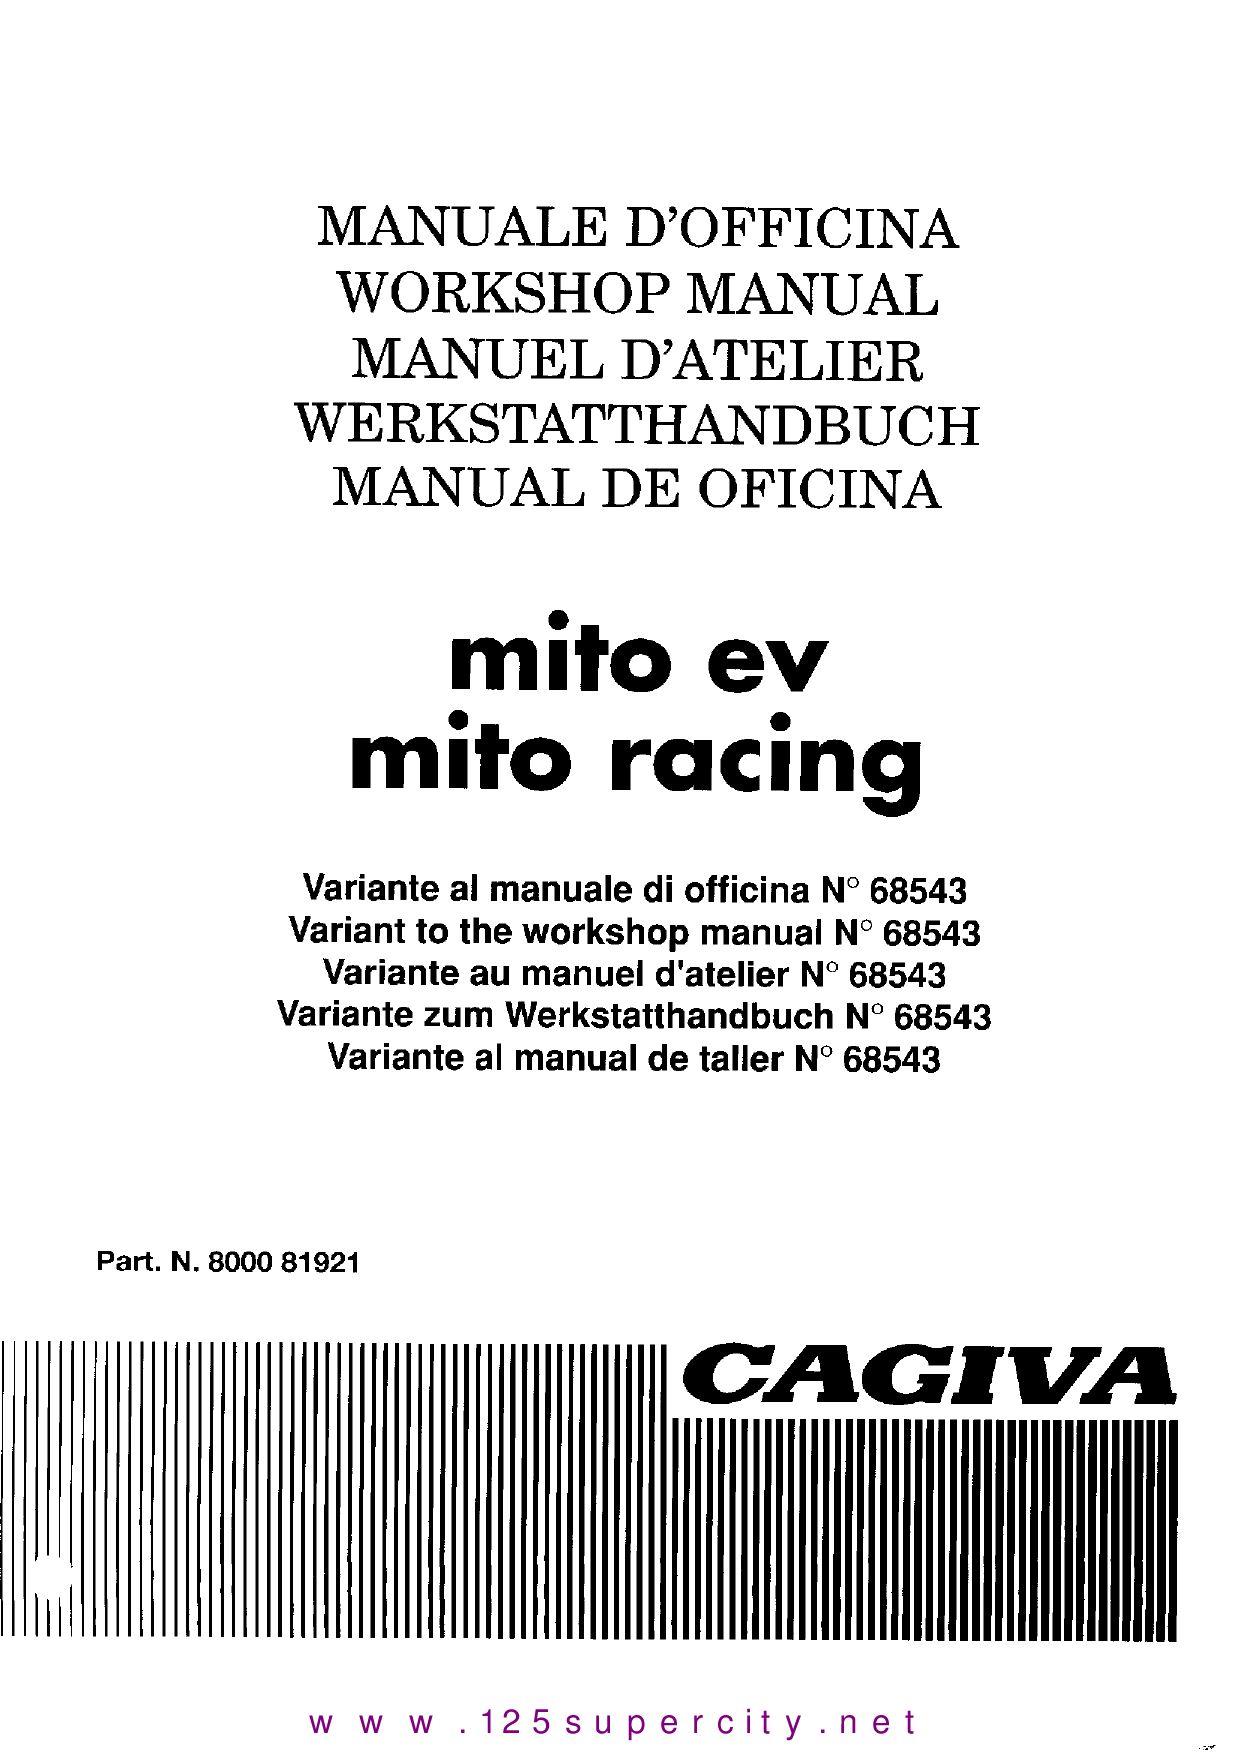 manuel cagiva mito ev racing 95 by christ cfouq - issuu